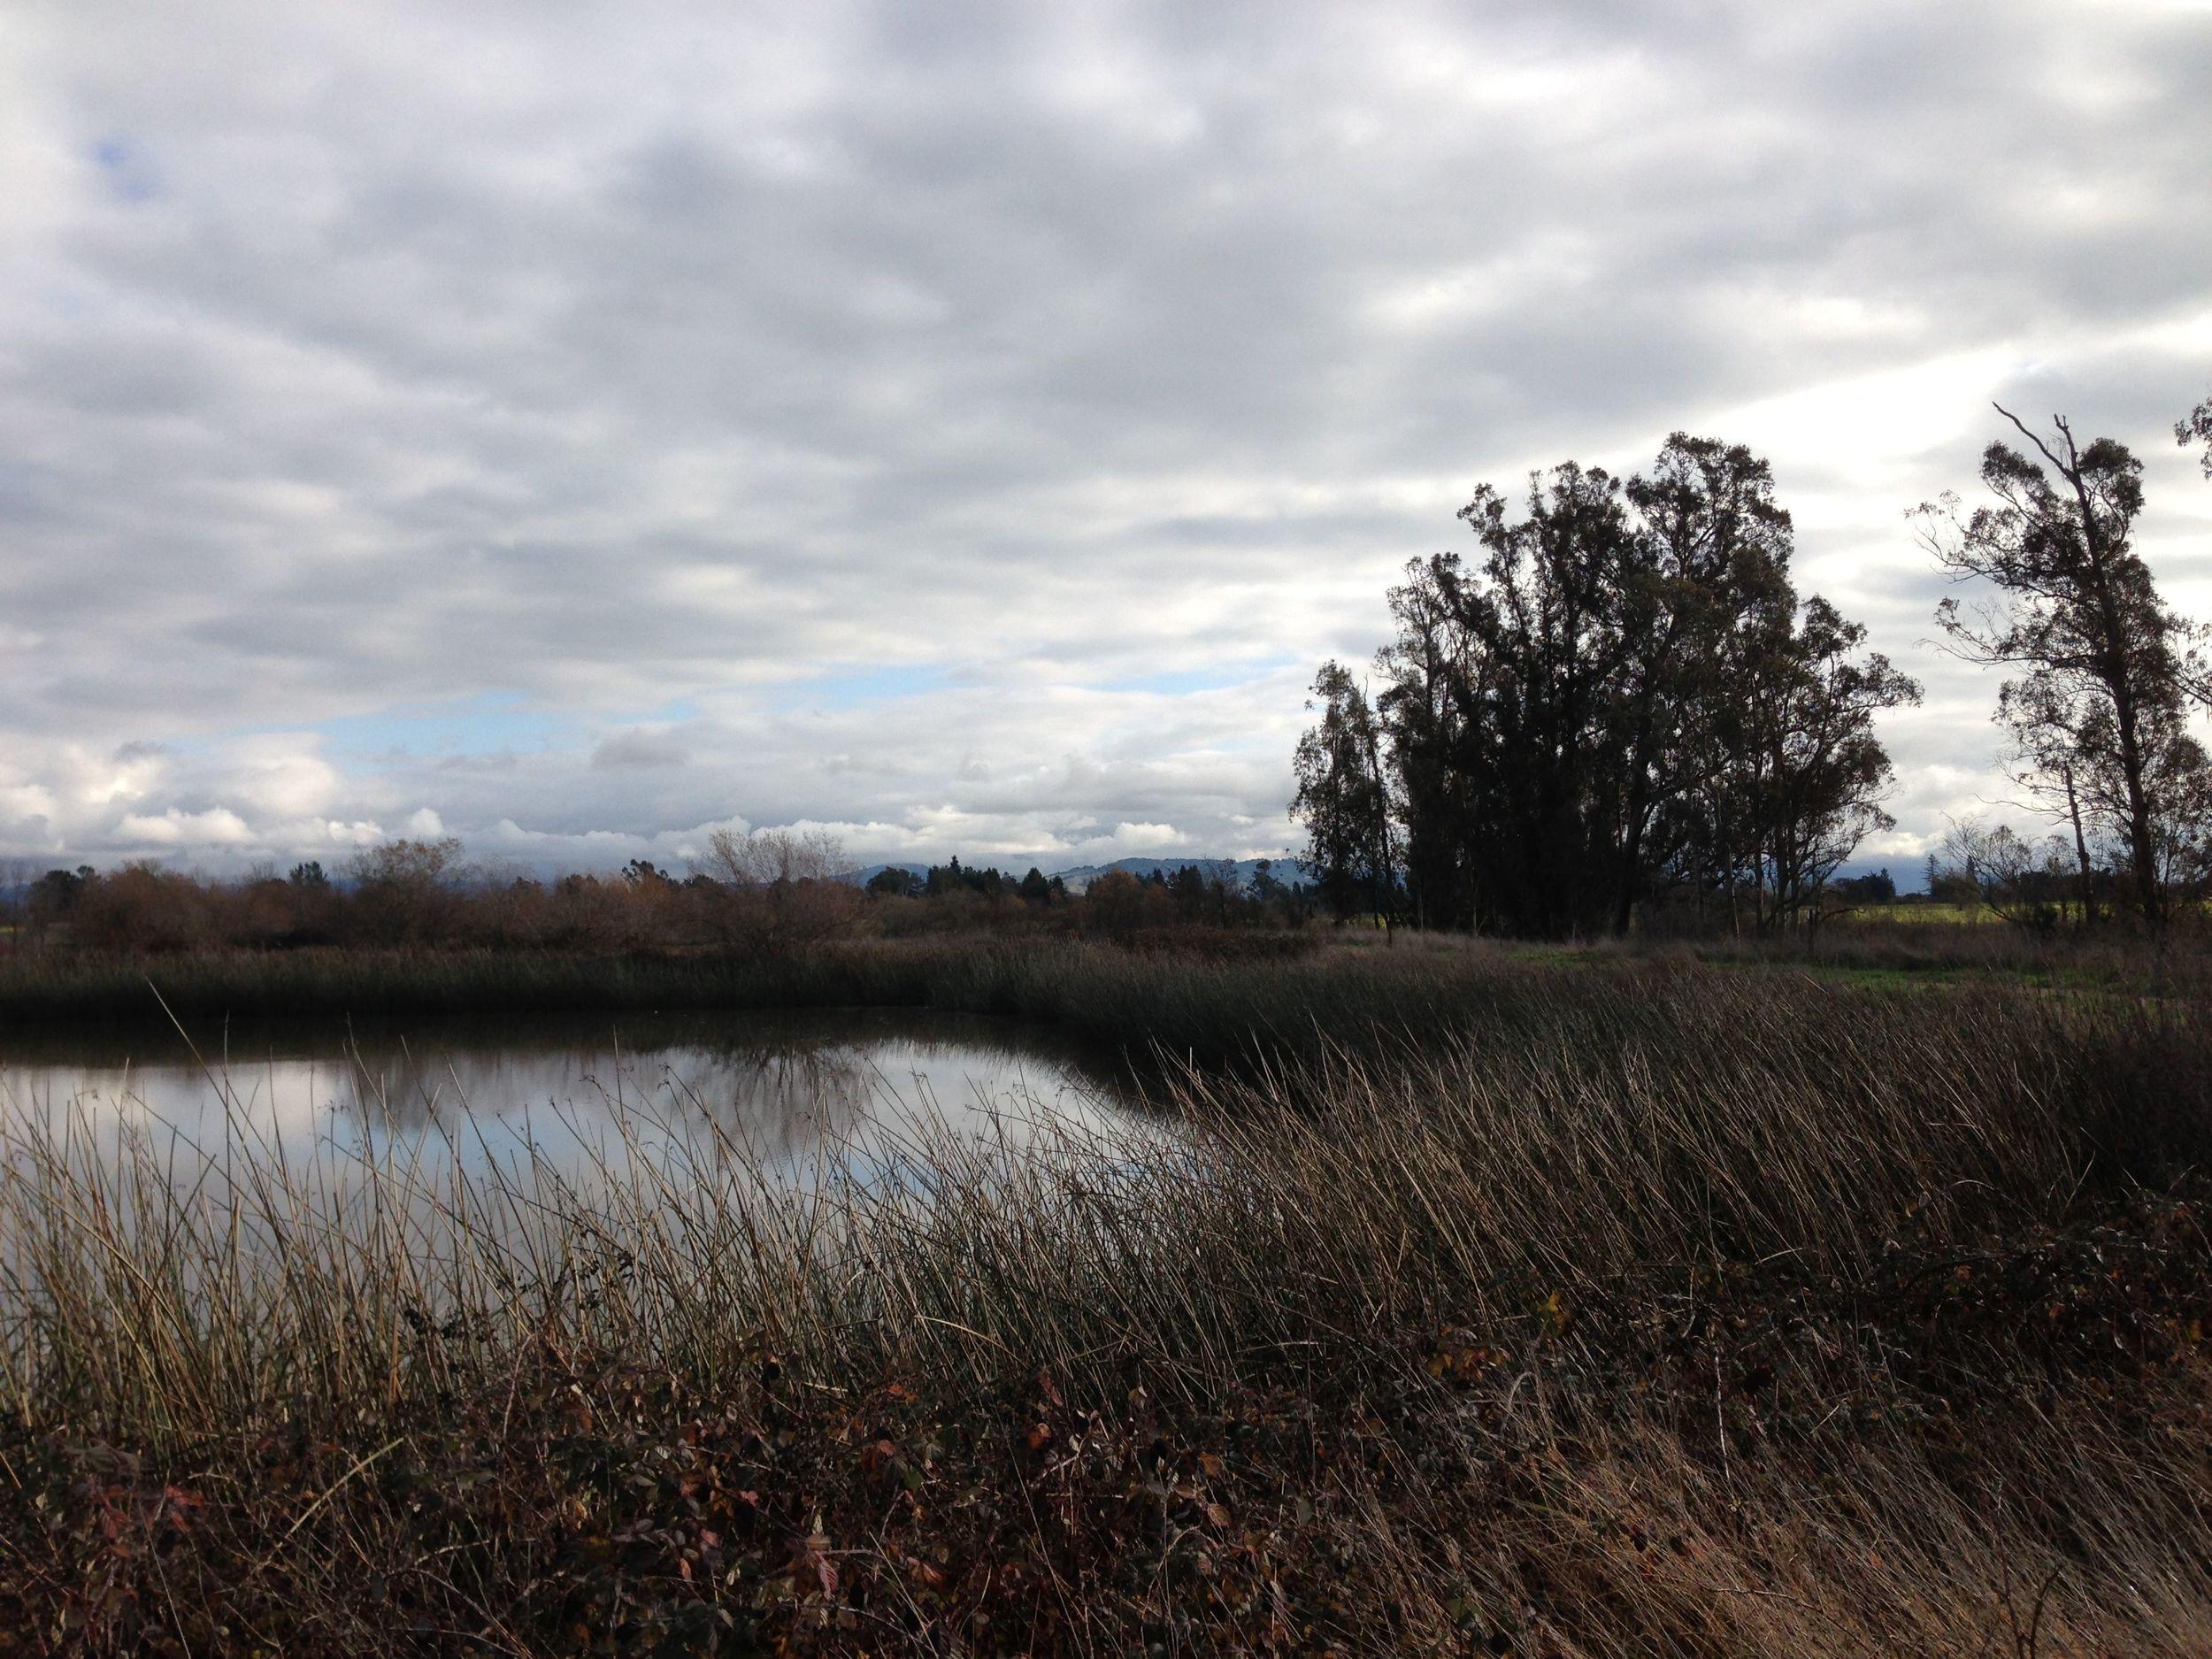 Laguna de Santa Rosa